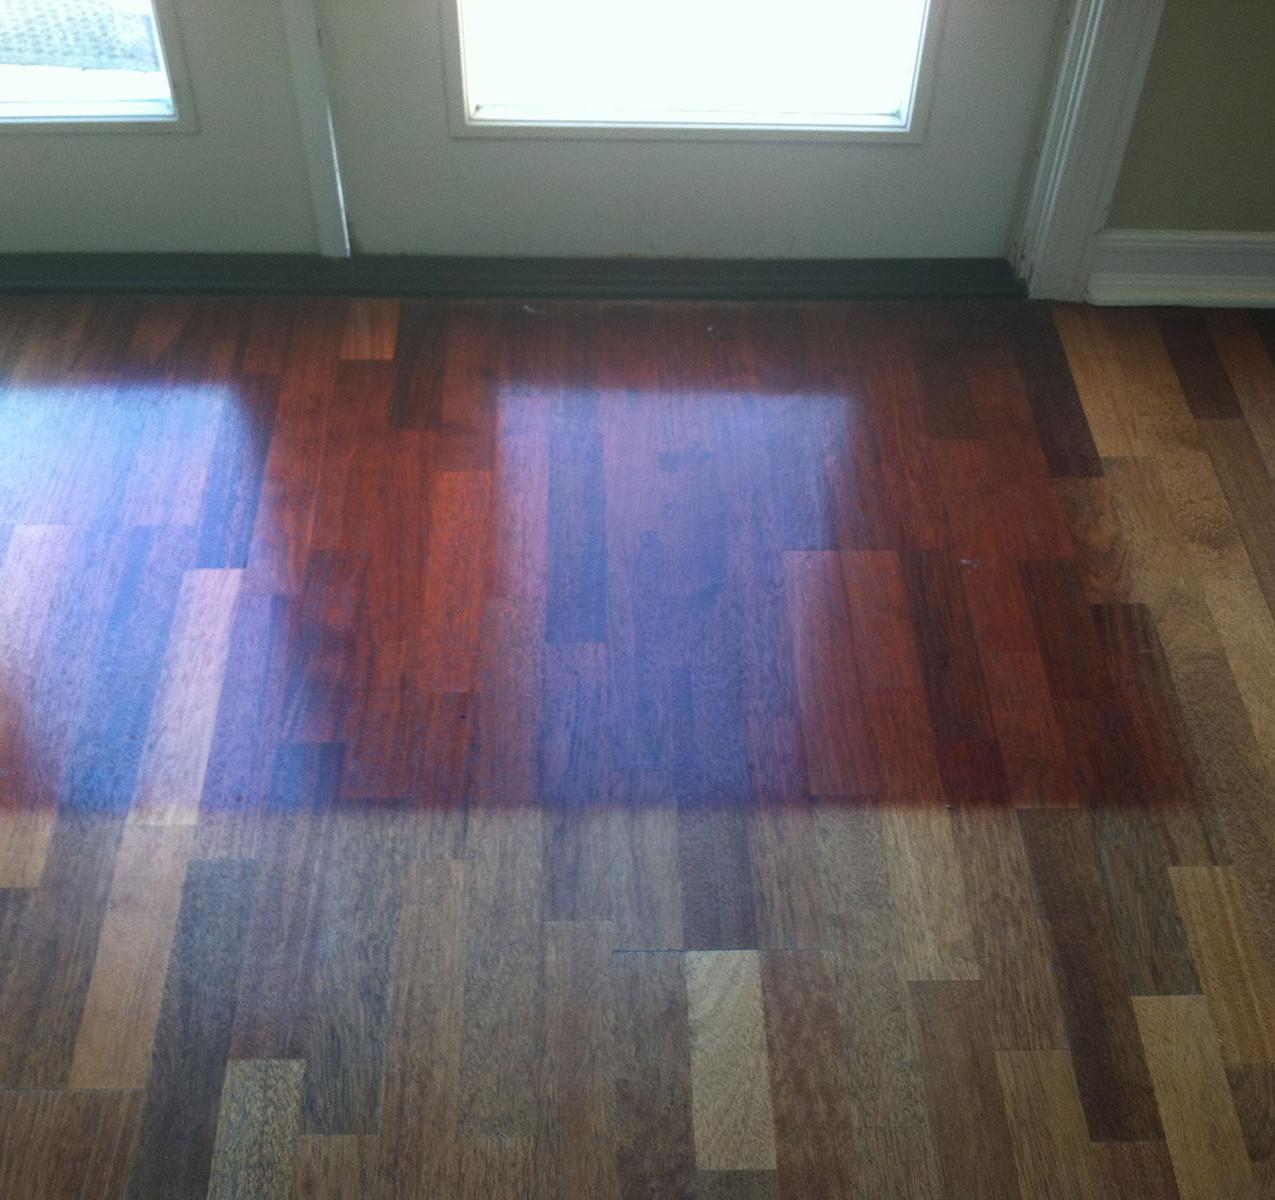 Damage from sun on floors